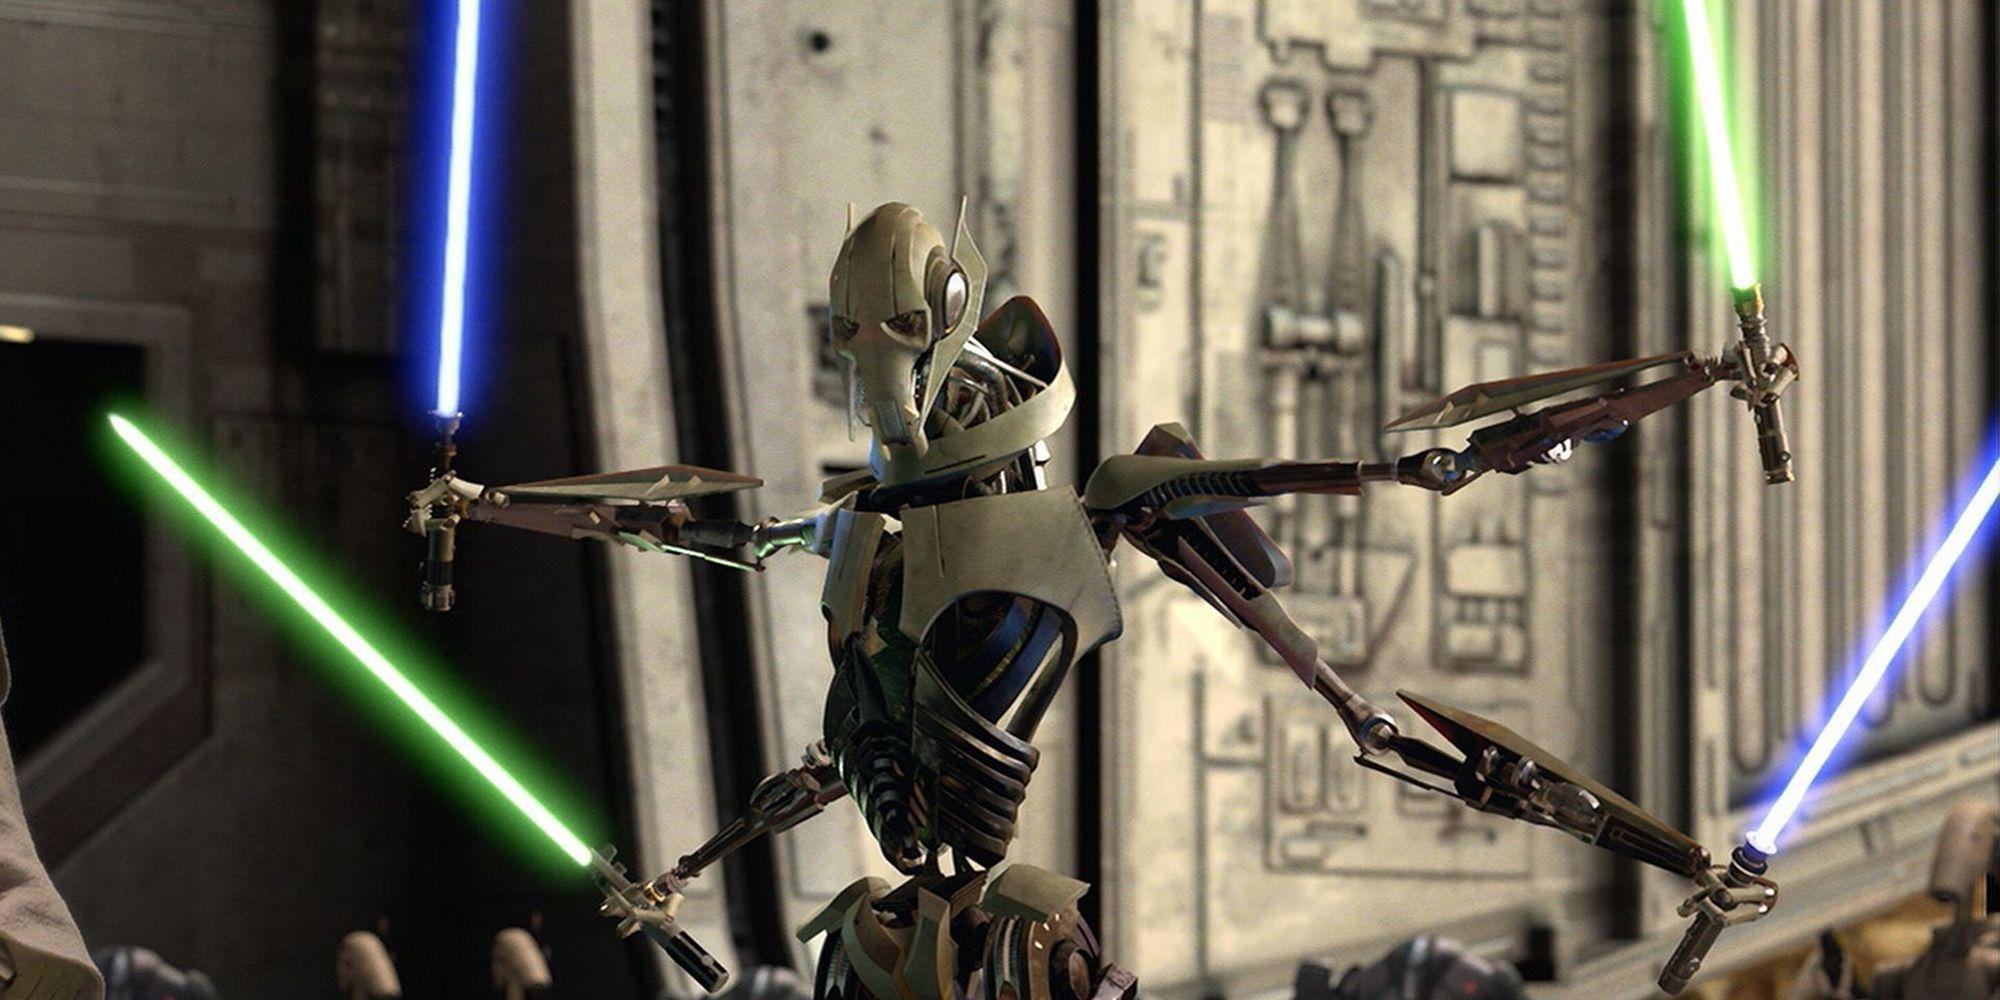 Star Wars: General Grievous Kept the Braids of Jedi Padawans He Murdered